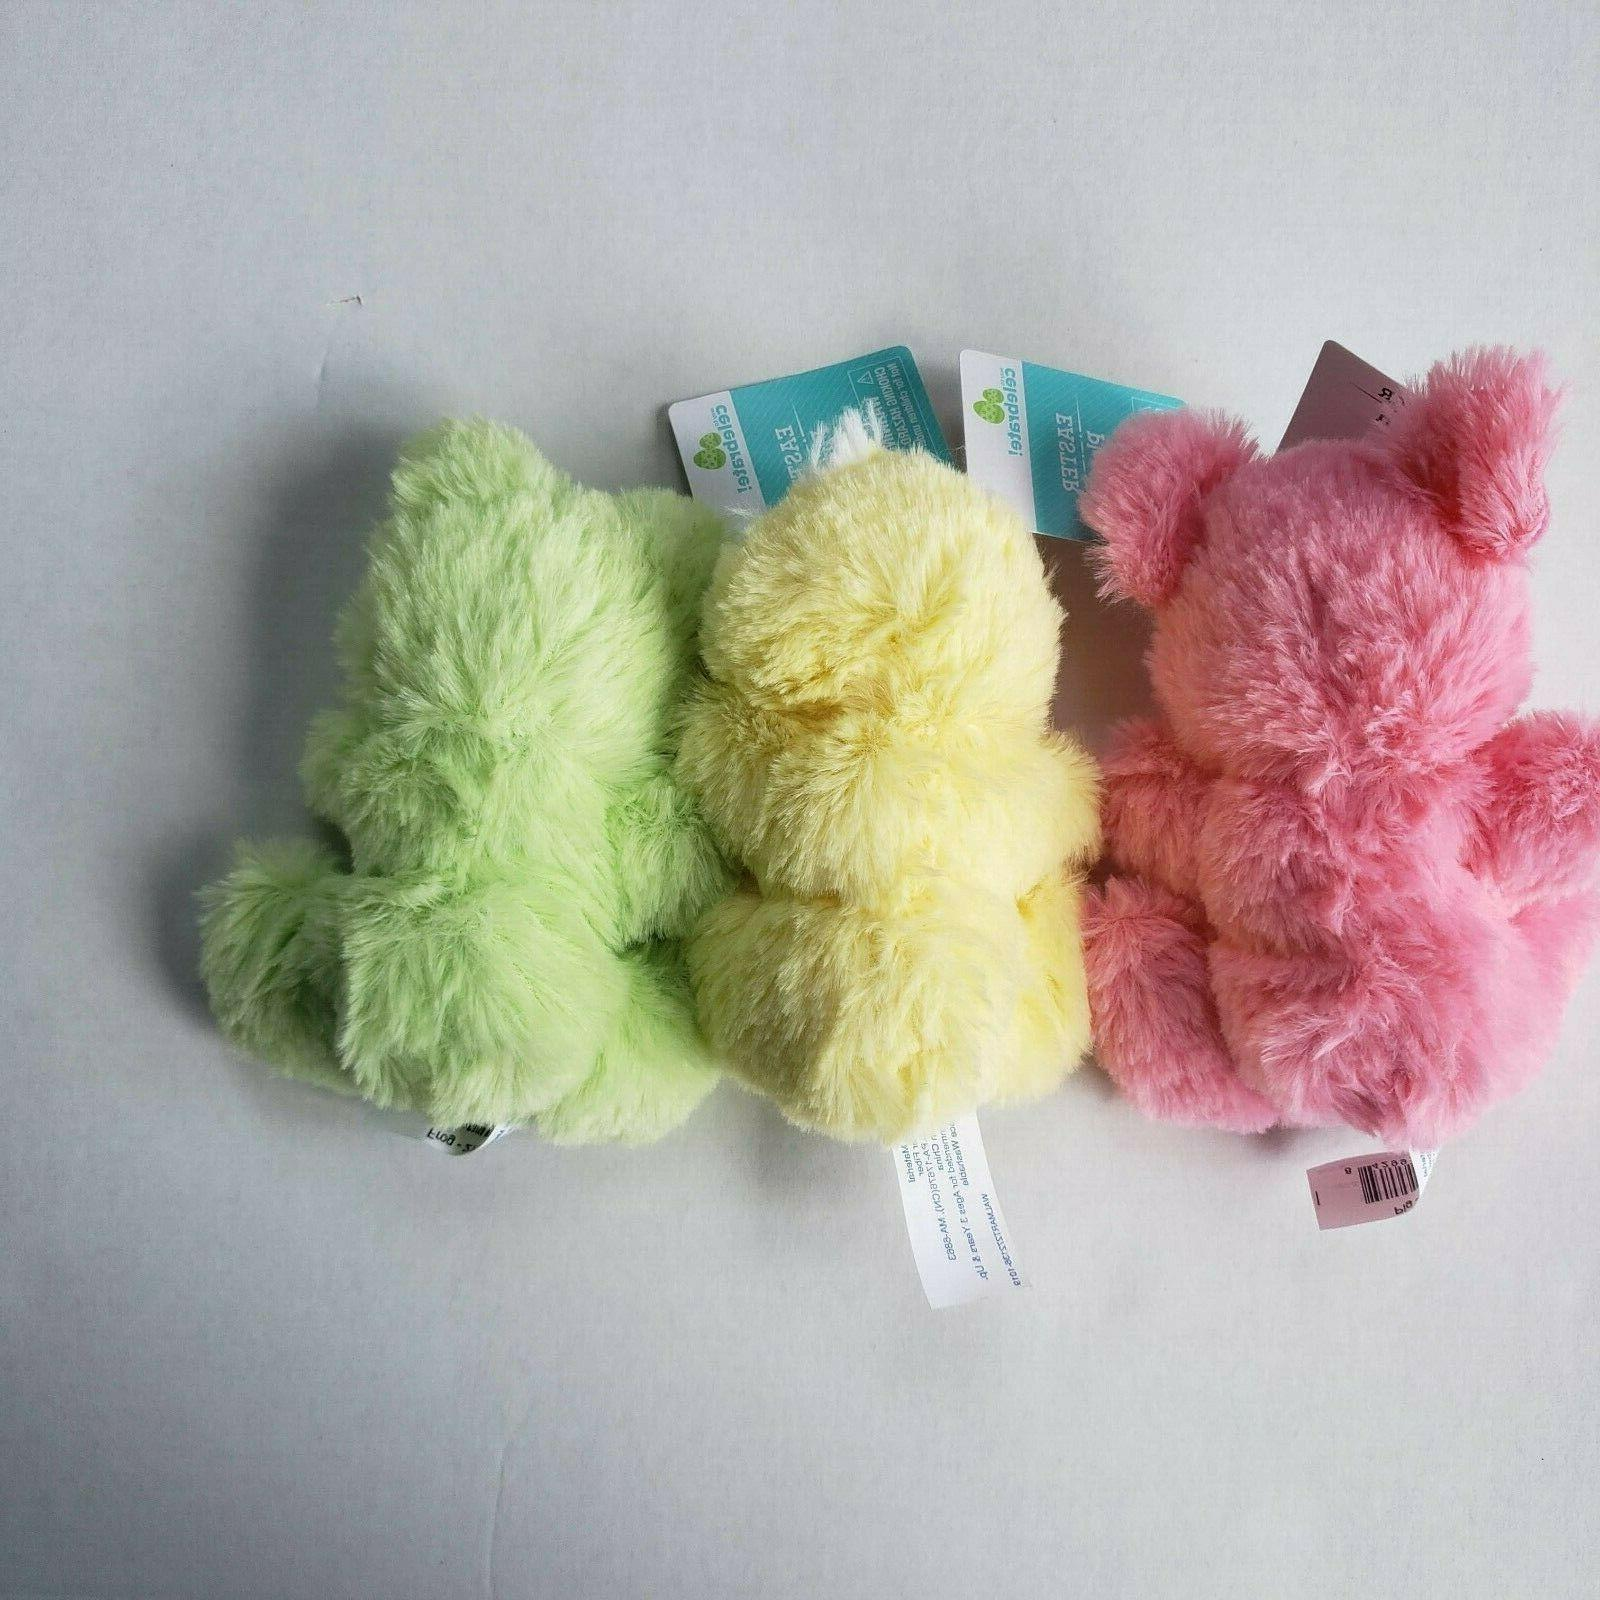 Mini Stuffed Animals Of